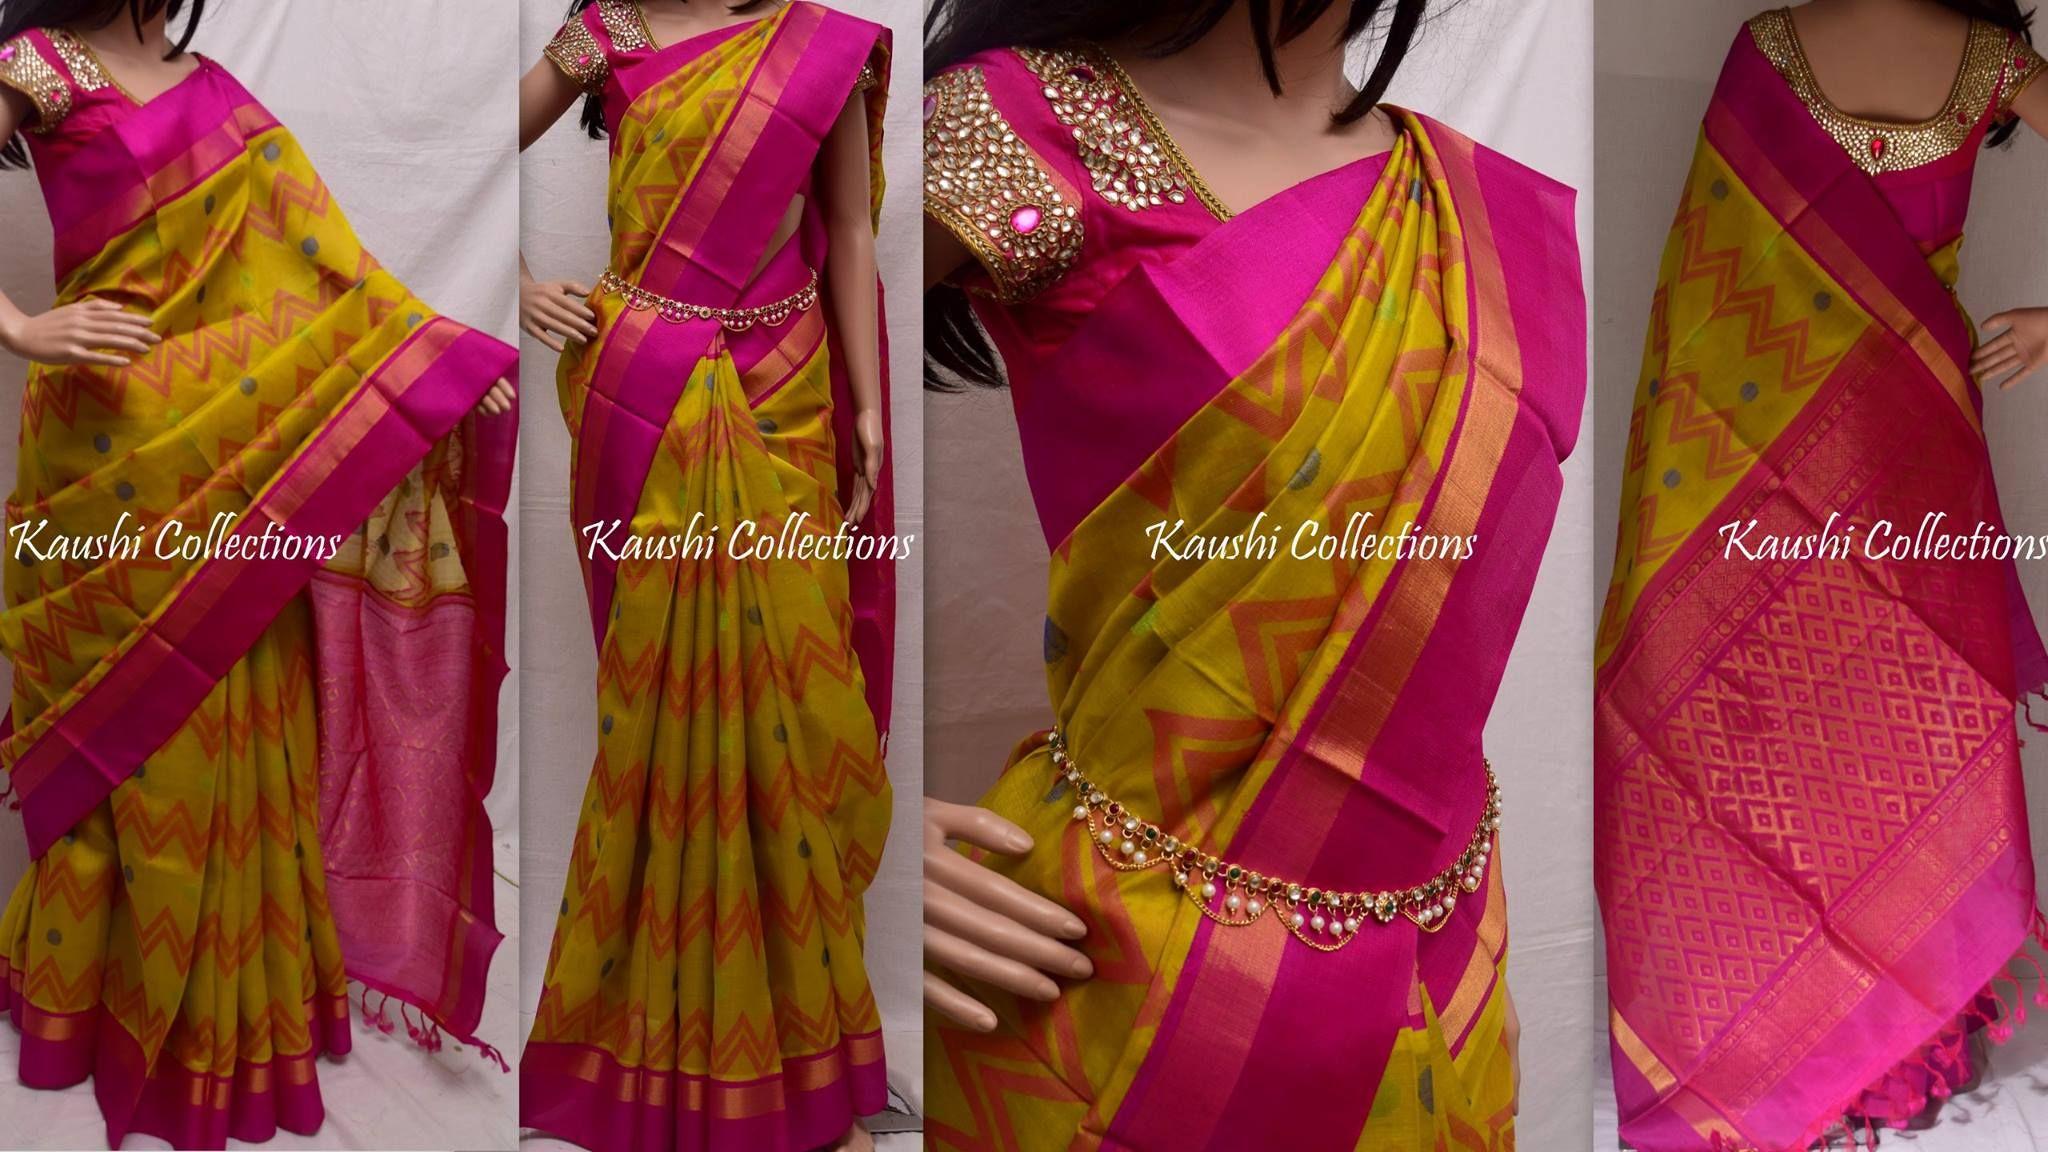 b7a332ecf7 5000Rs AVAILABLE Kuppadam silk saree with rich pallu Blouse:Pink(pallu  colour) Write us for order sparklingfashion3@gmail.com or whatsapp:  9949519207 21 ...